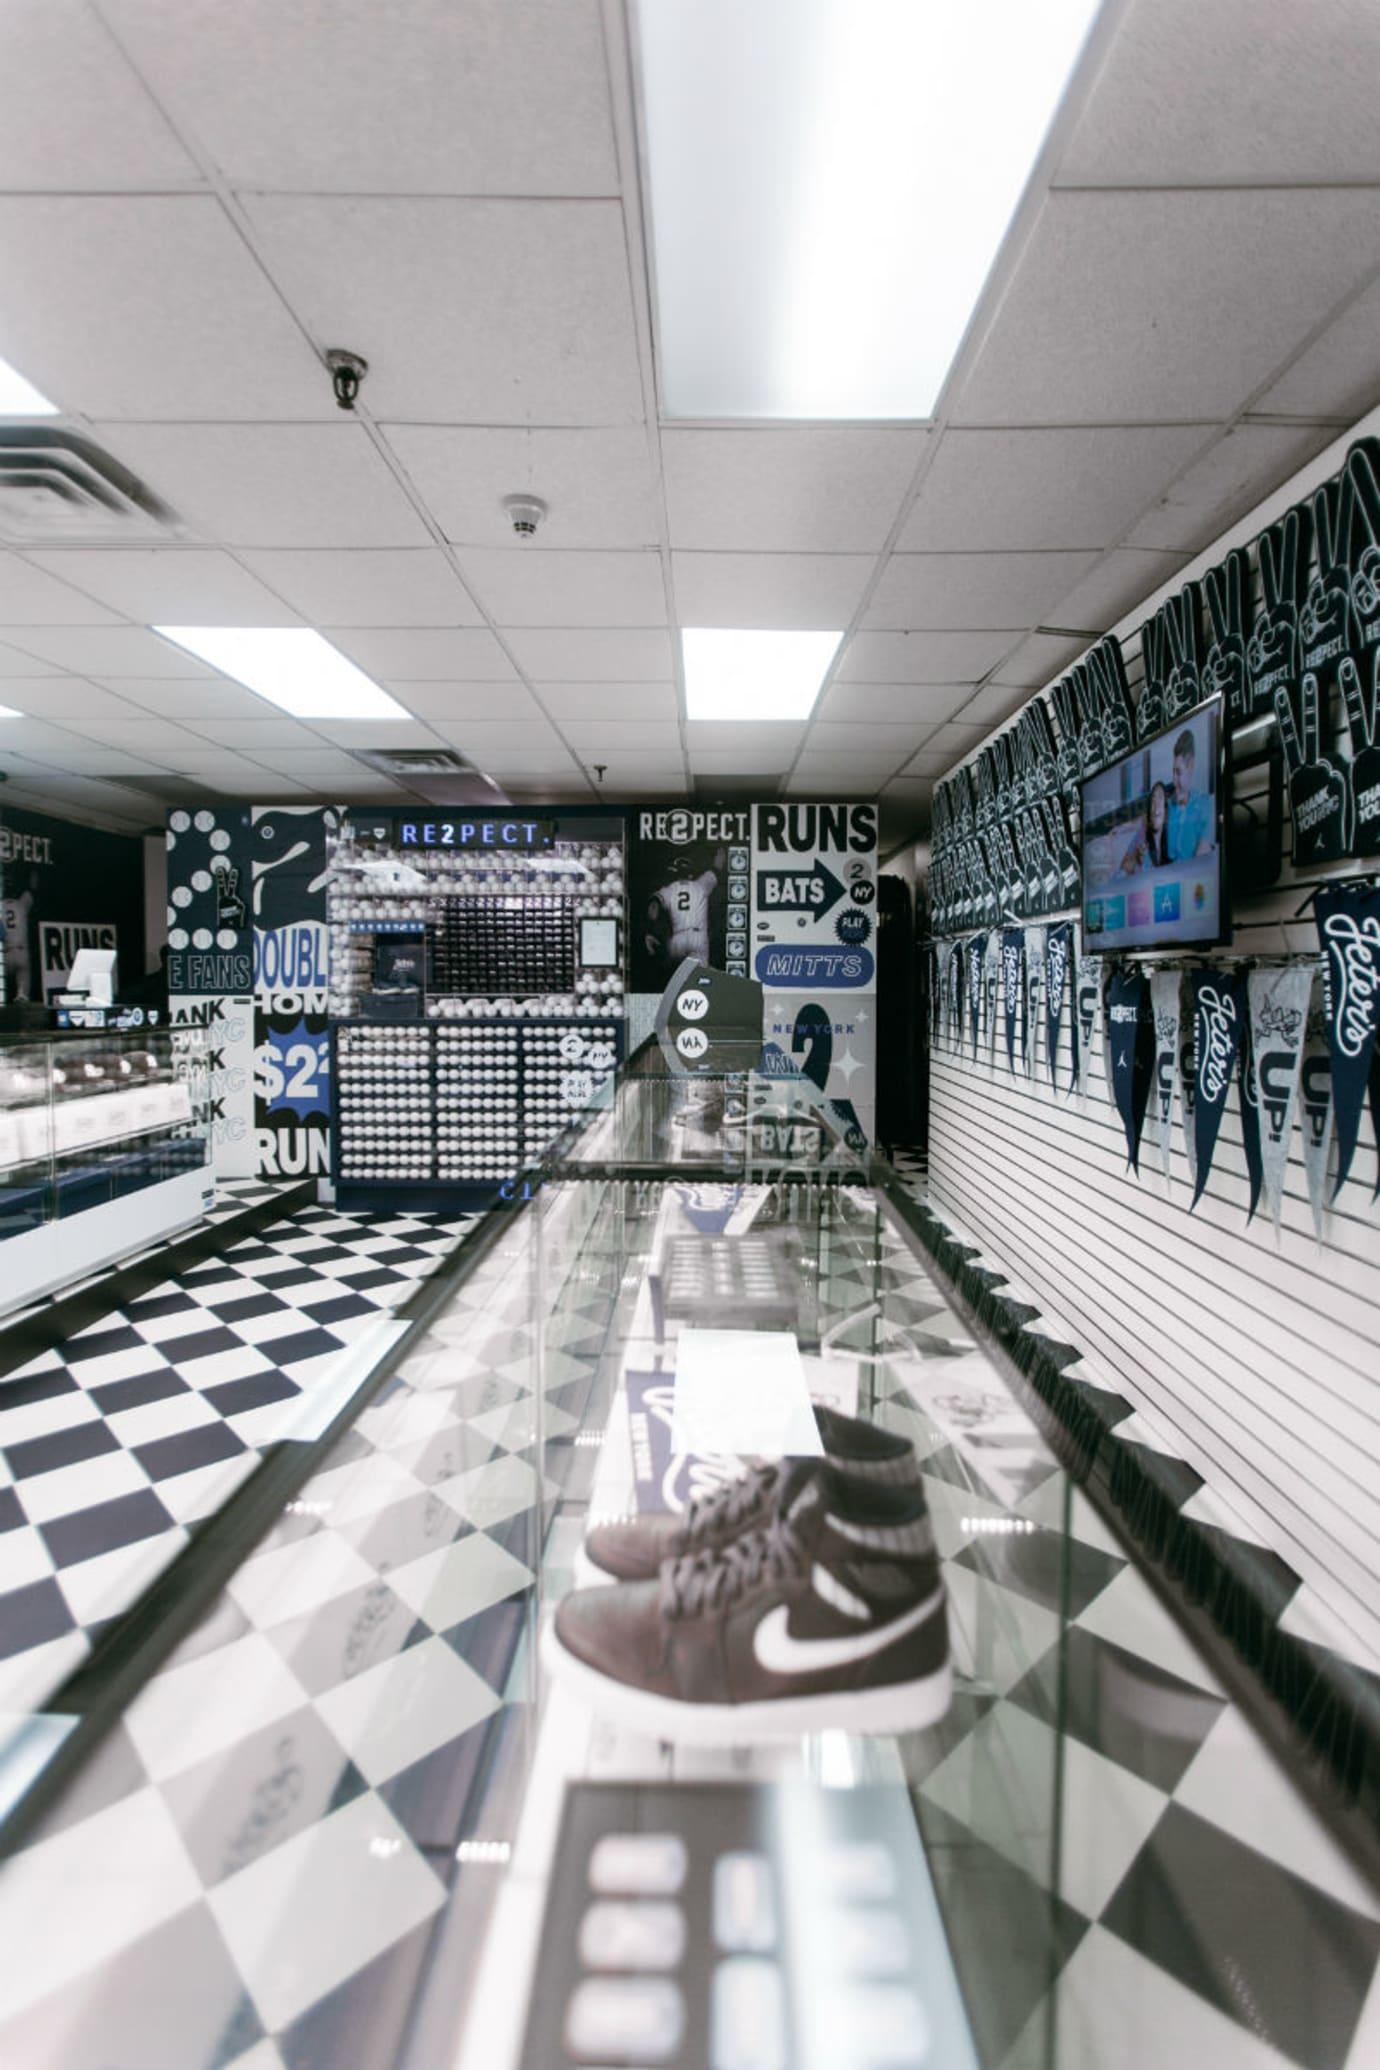 383821e8bd2b Derek Jeter Air Jordan 11 Pop-Up Shop in New York